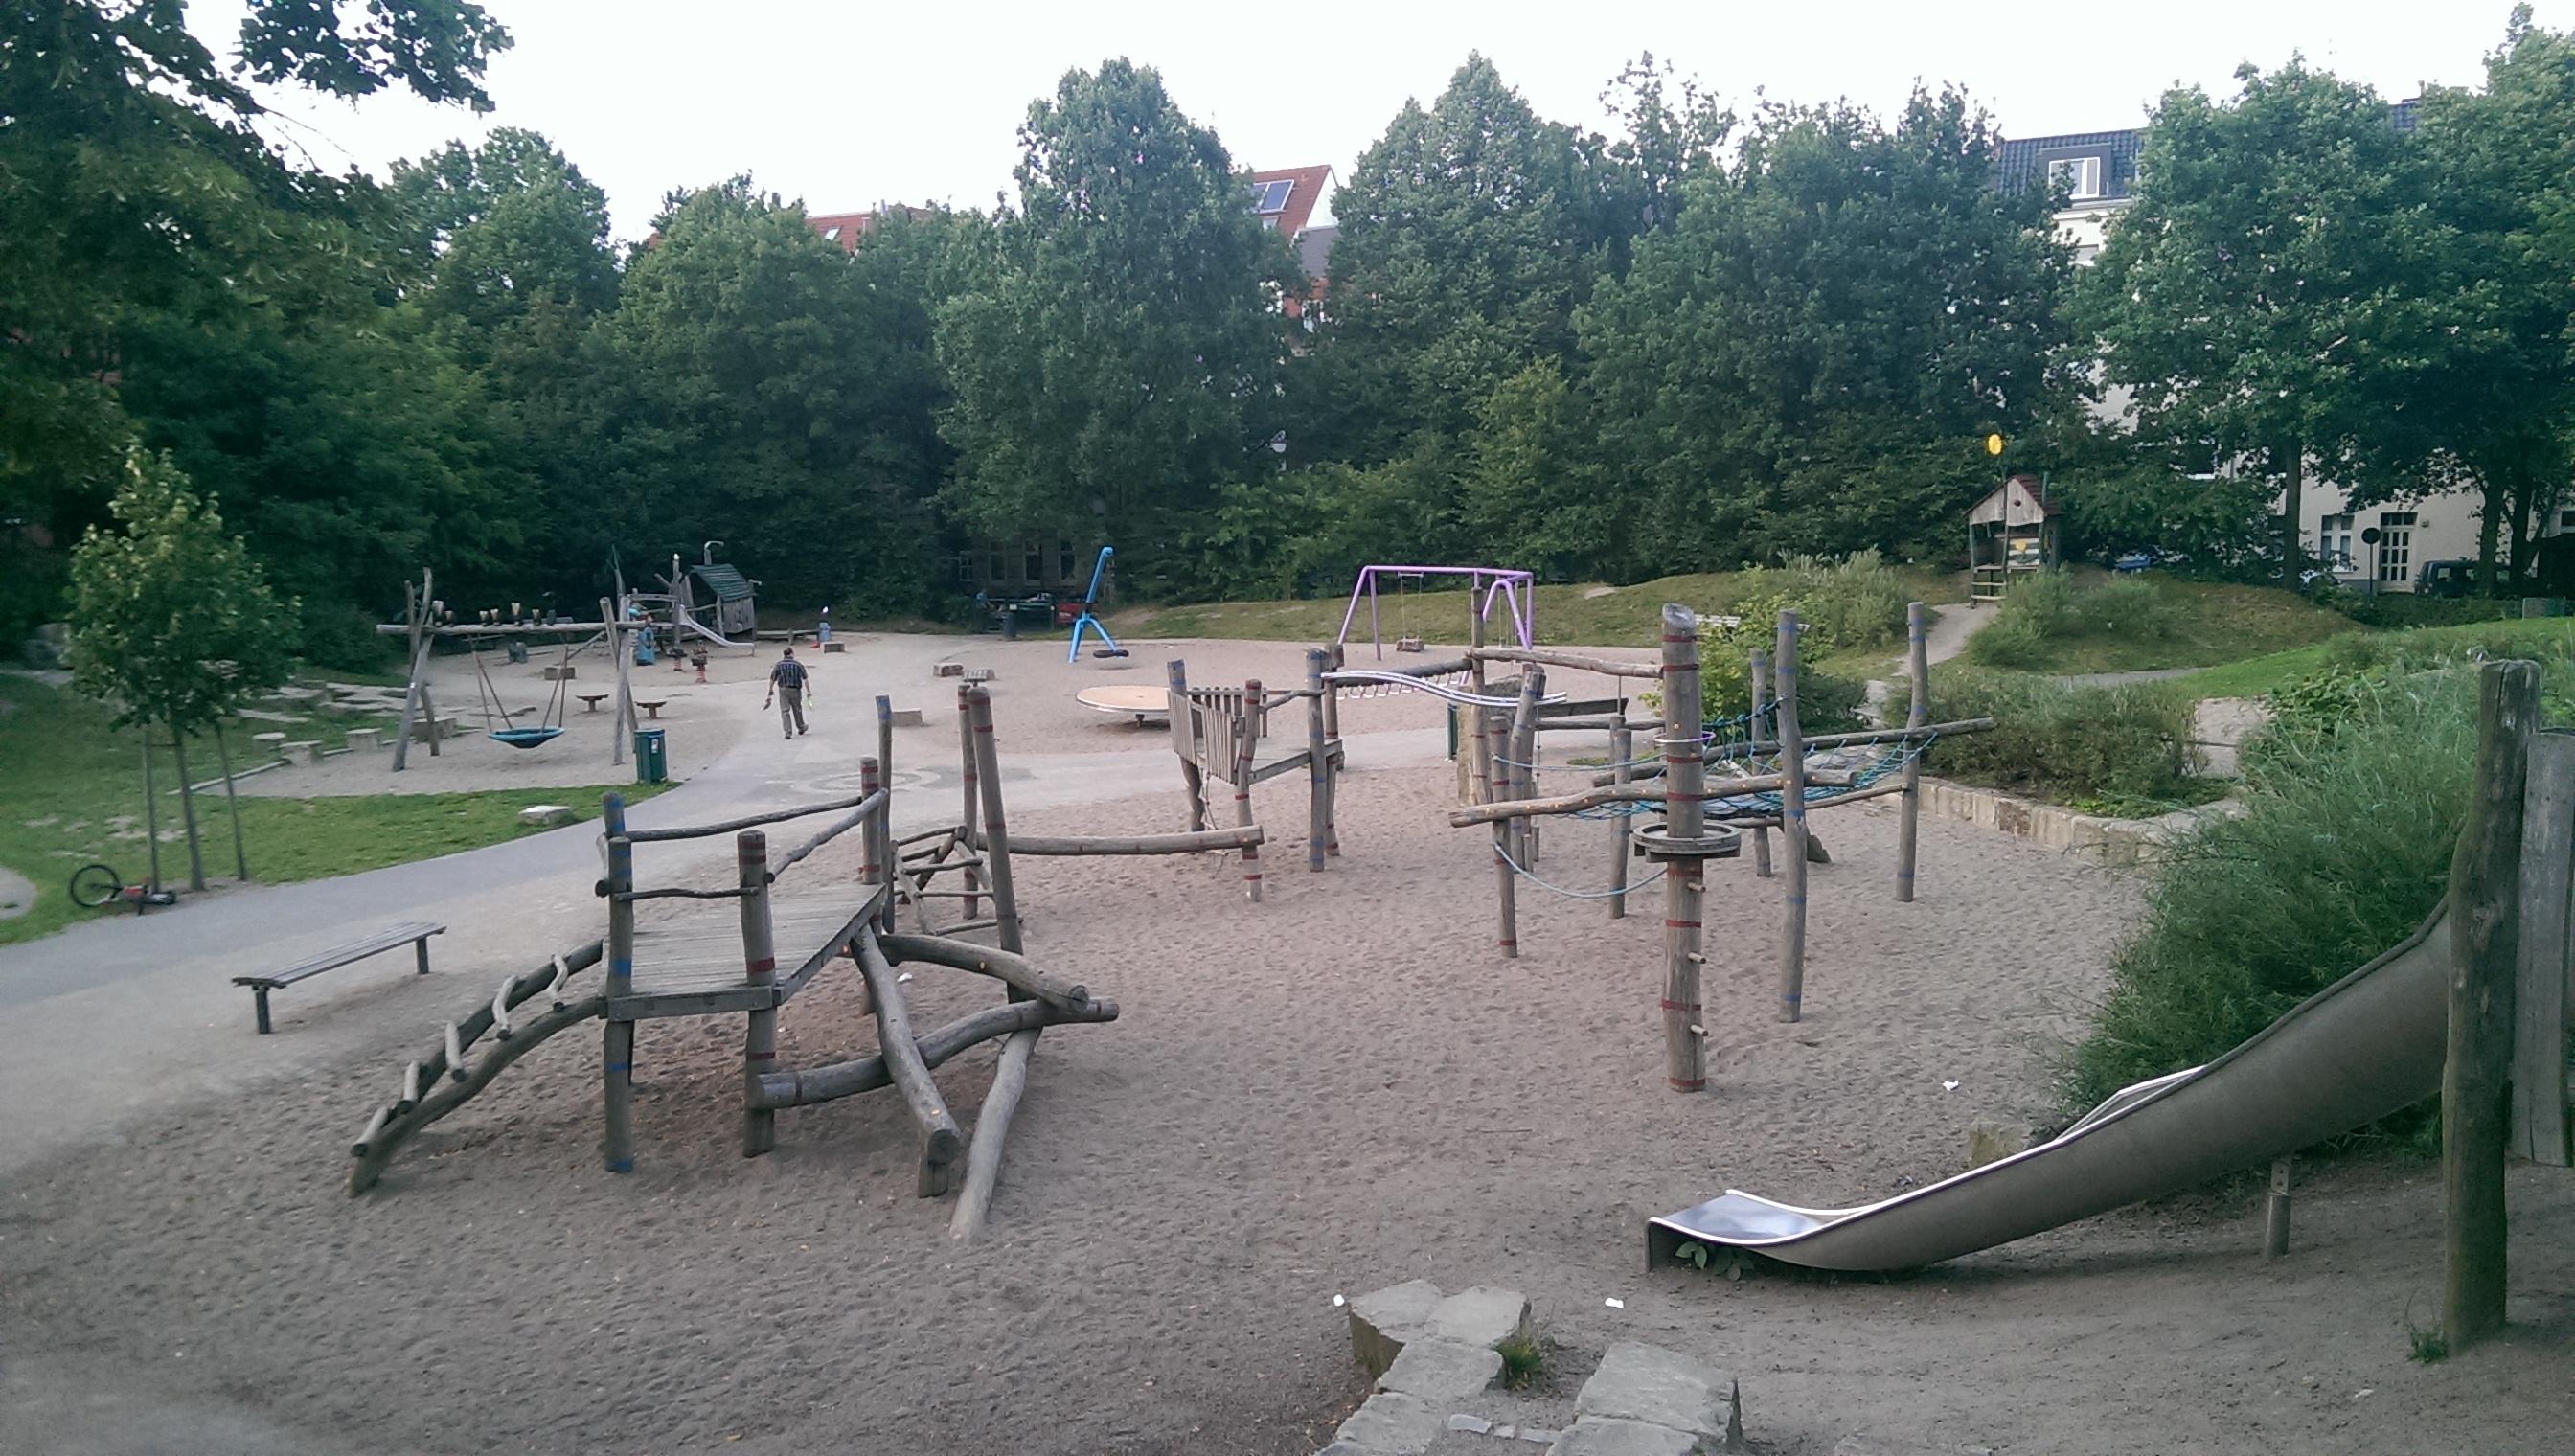 Spielplatz am Frappant